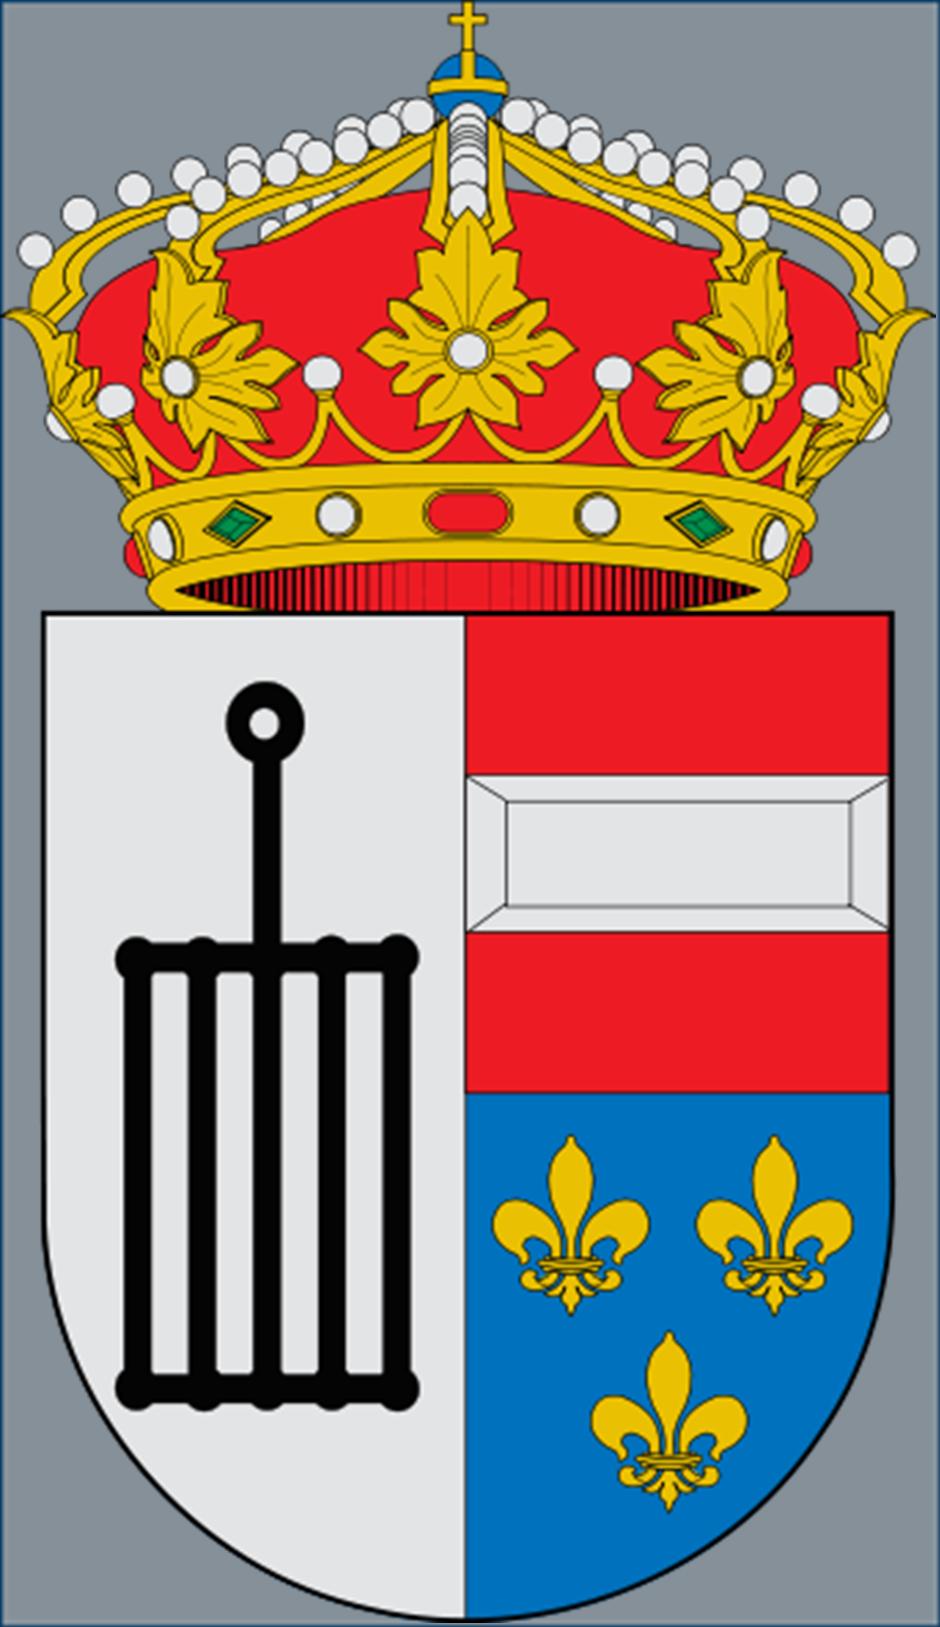 341px-Escudo_de_San_Lorenzo_del_Escorial.svg